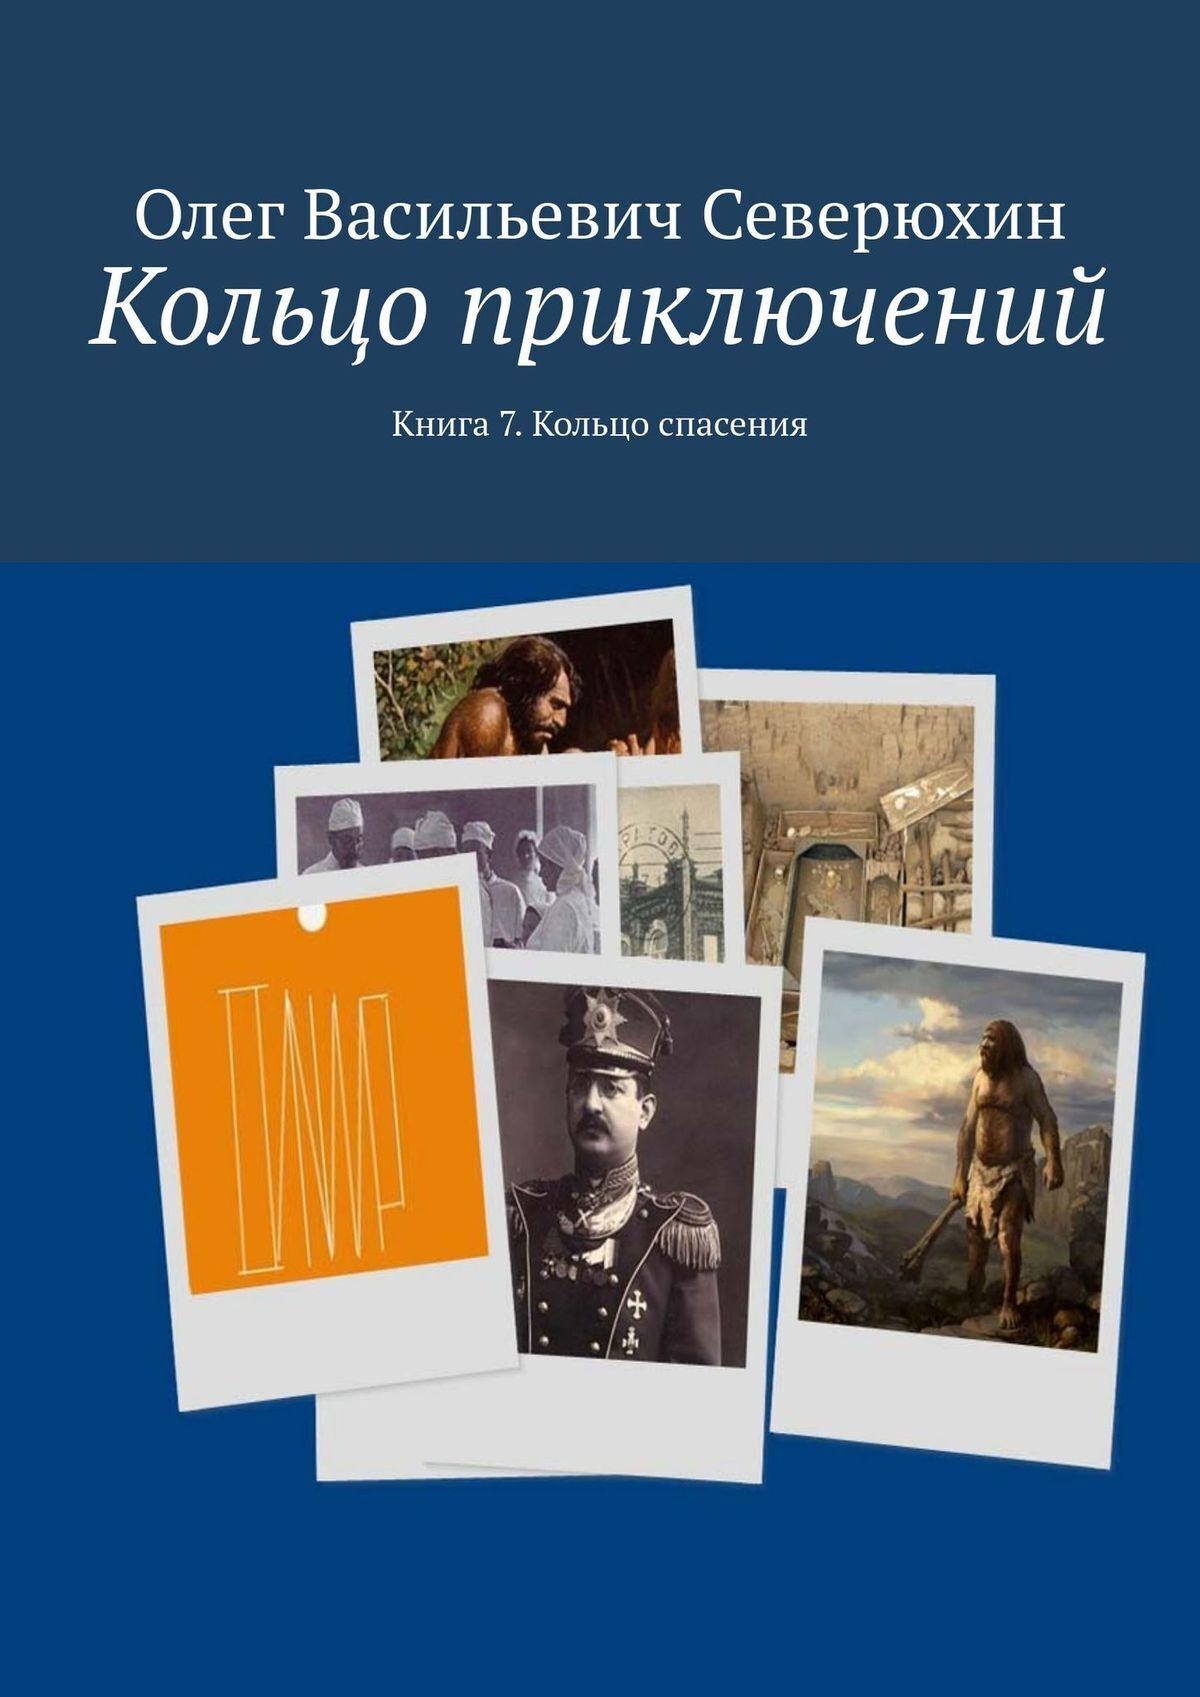 Олег Васильевич Северюхин Кольцо приключений. Книга 7. Кольцо спасения цена